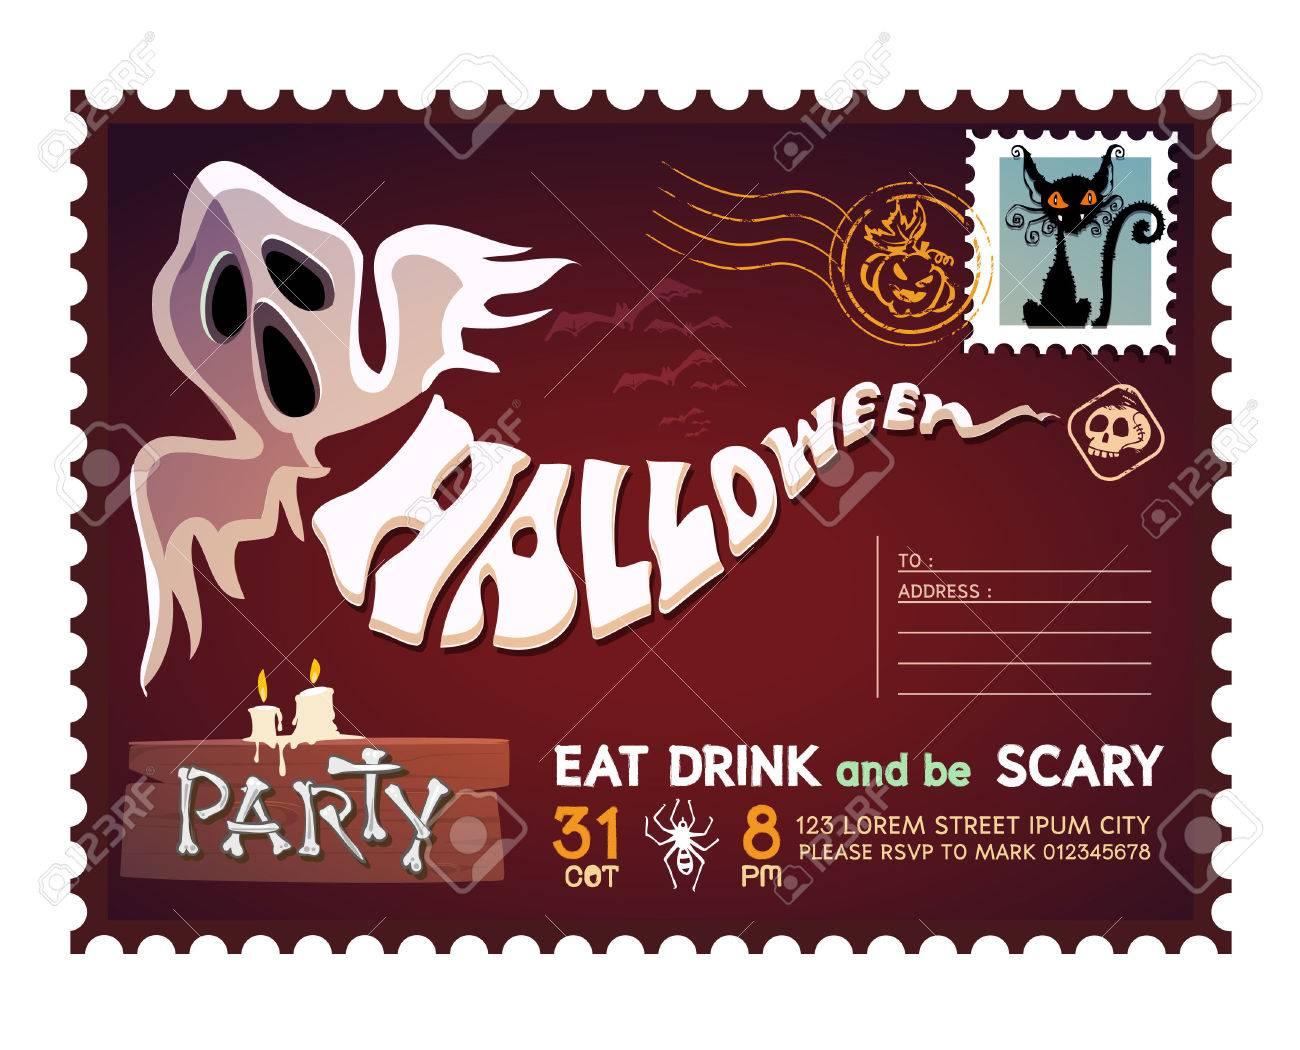 Happy Halloween Postcard invitation background design layout. - 46907235